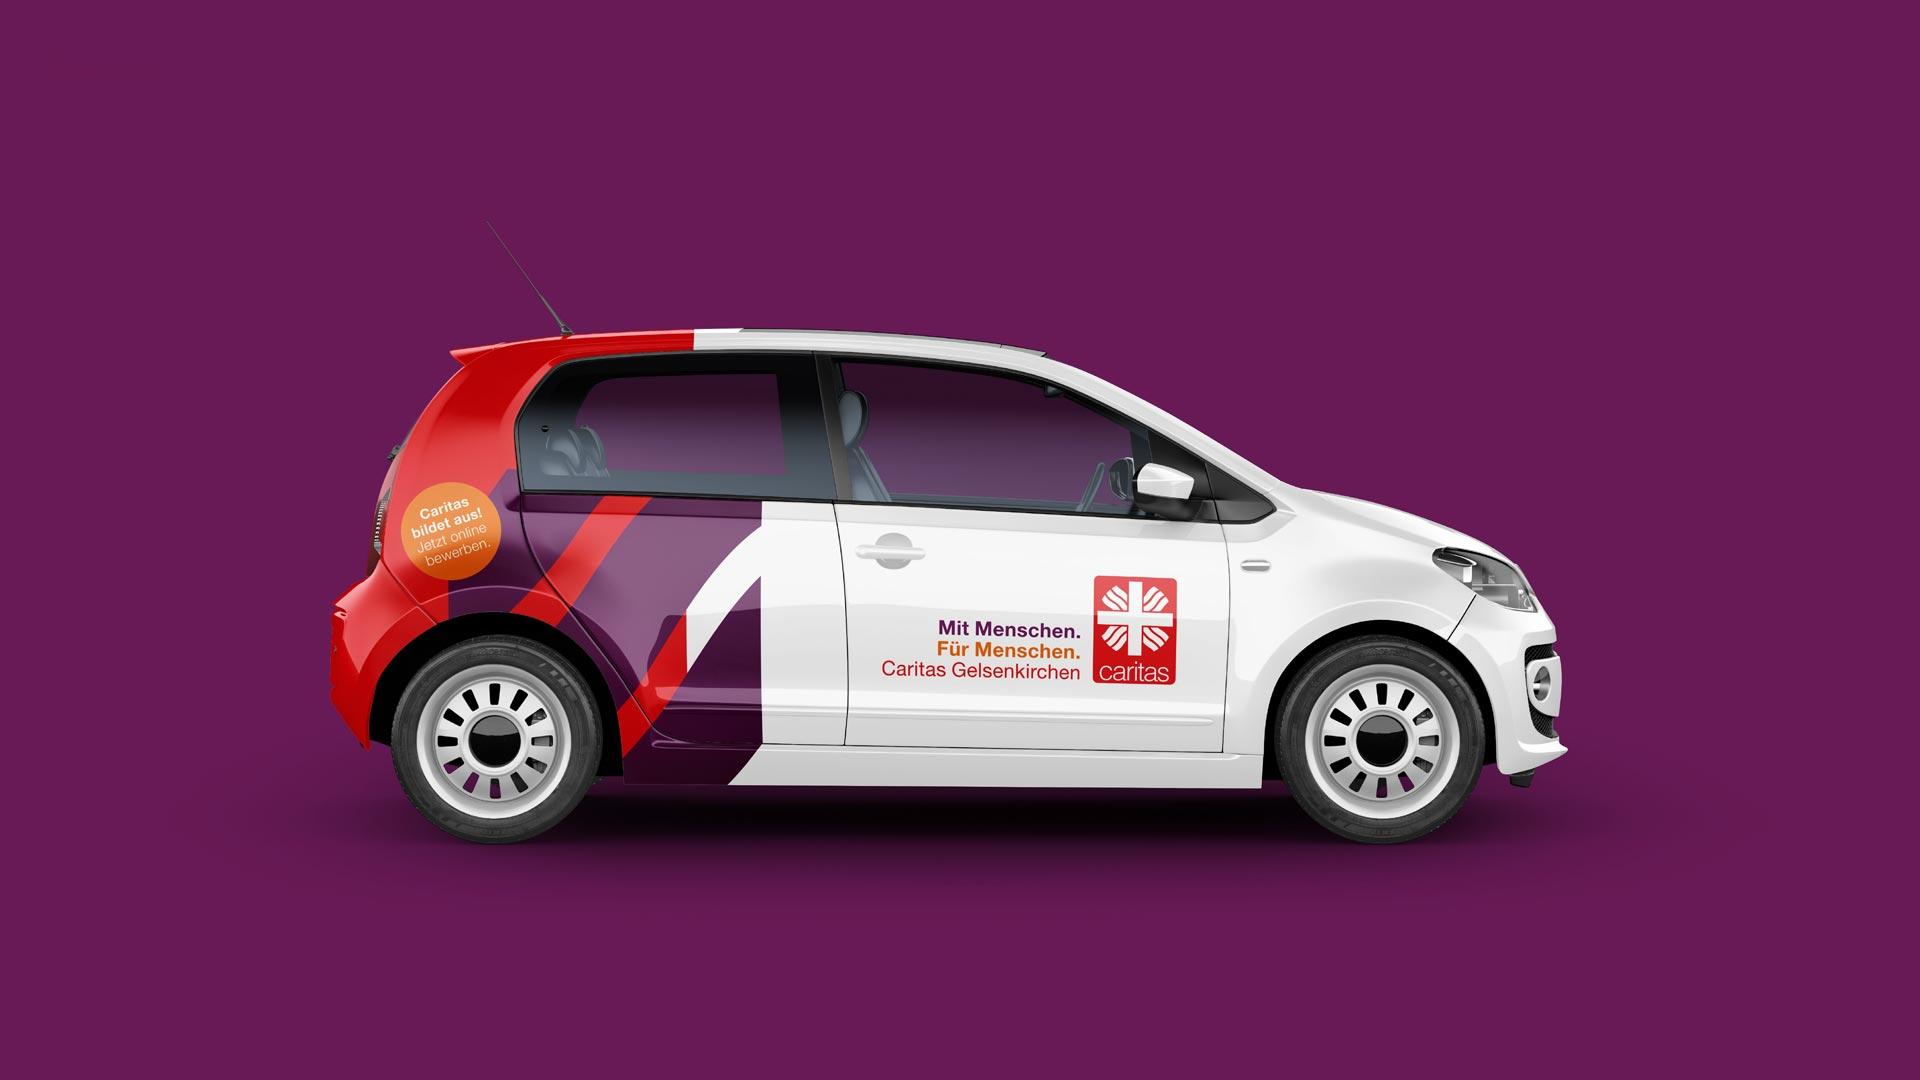 Fahrzeugbeschriftung im neuen Corporate Design